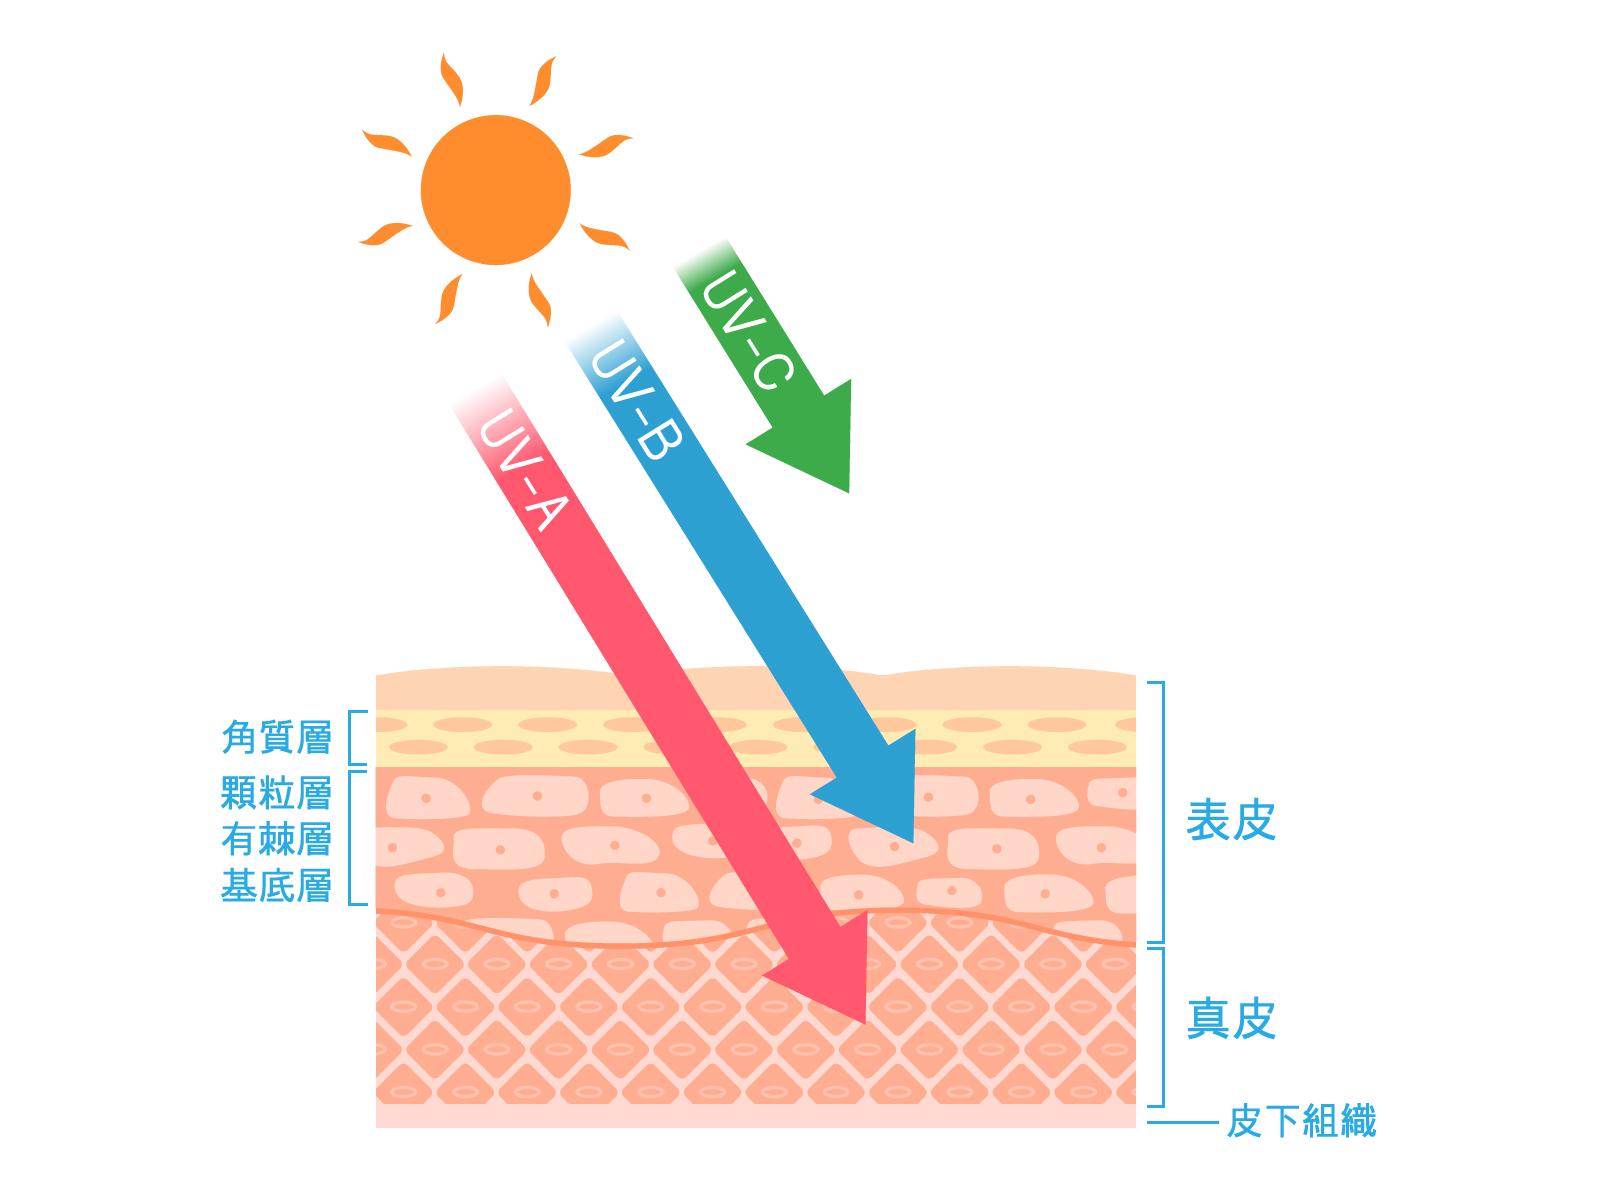 UV-A/UV-B/UV-C/紫外線の種類